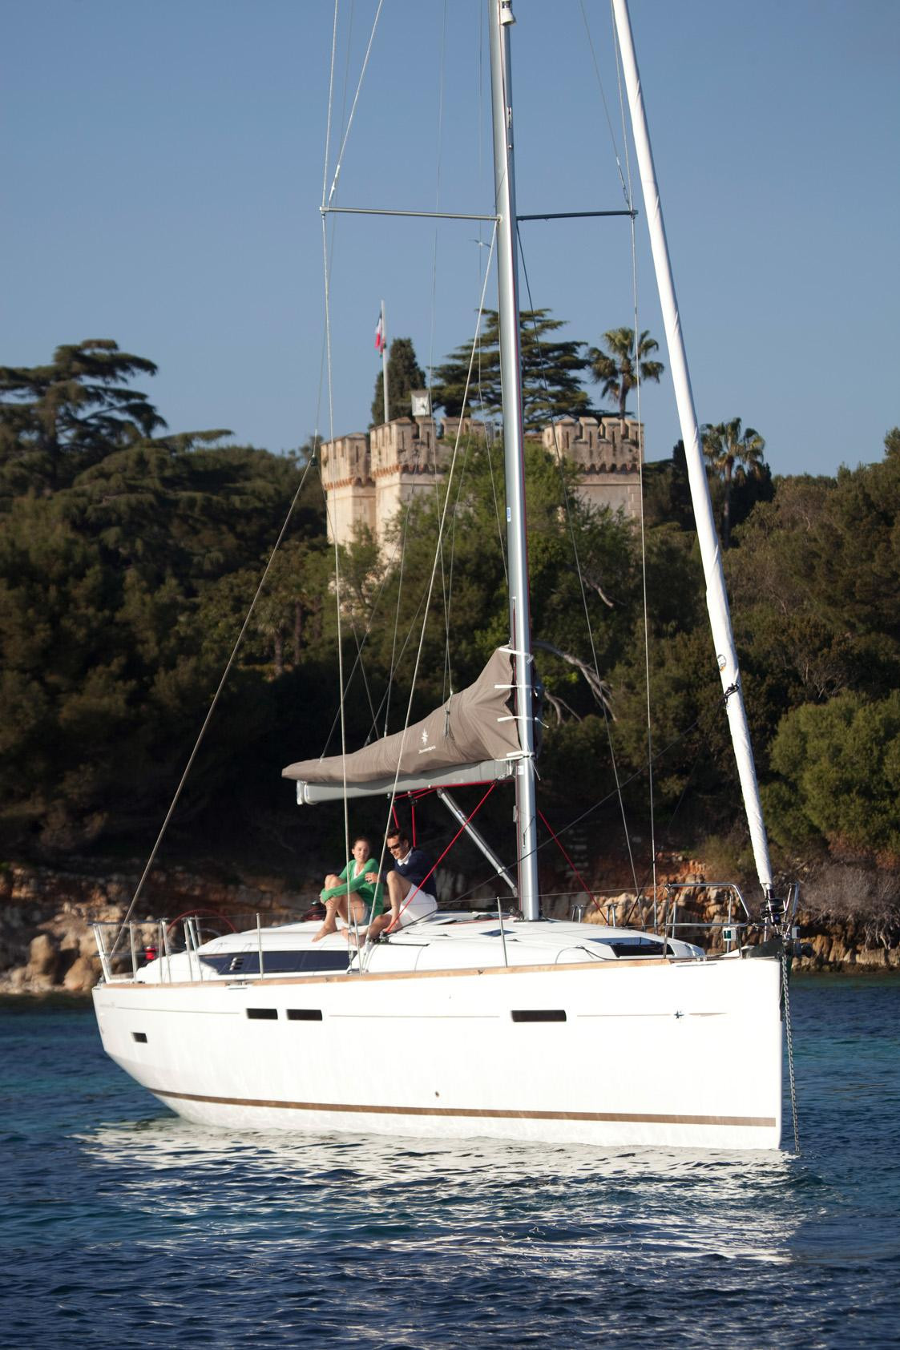 Sailing yacht Bavaria 46 Cruiser for charter in Greece